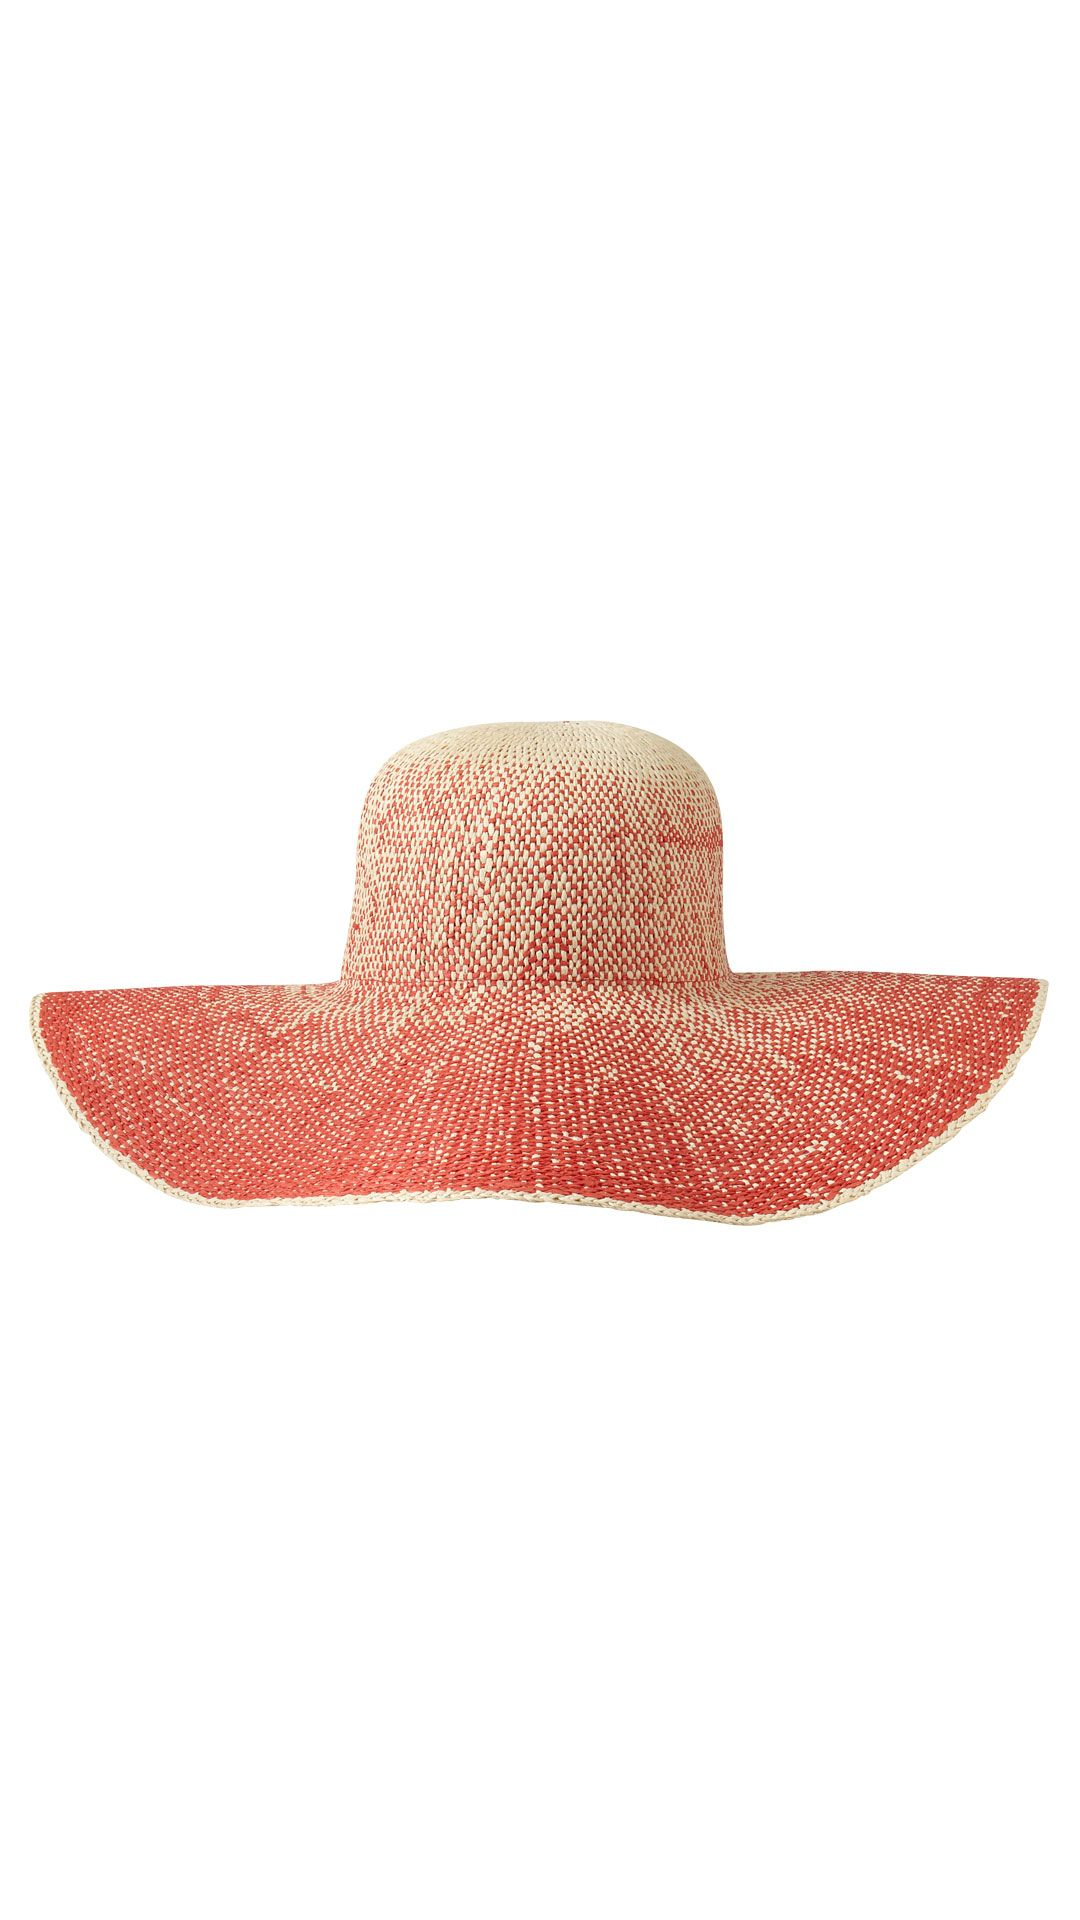 Cute Summer Hats for Women - Stylish Womens Floppy Sun Hats and Fedoras 2e6c86ca0d9